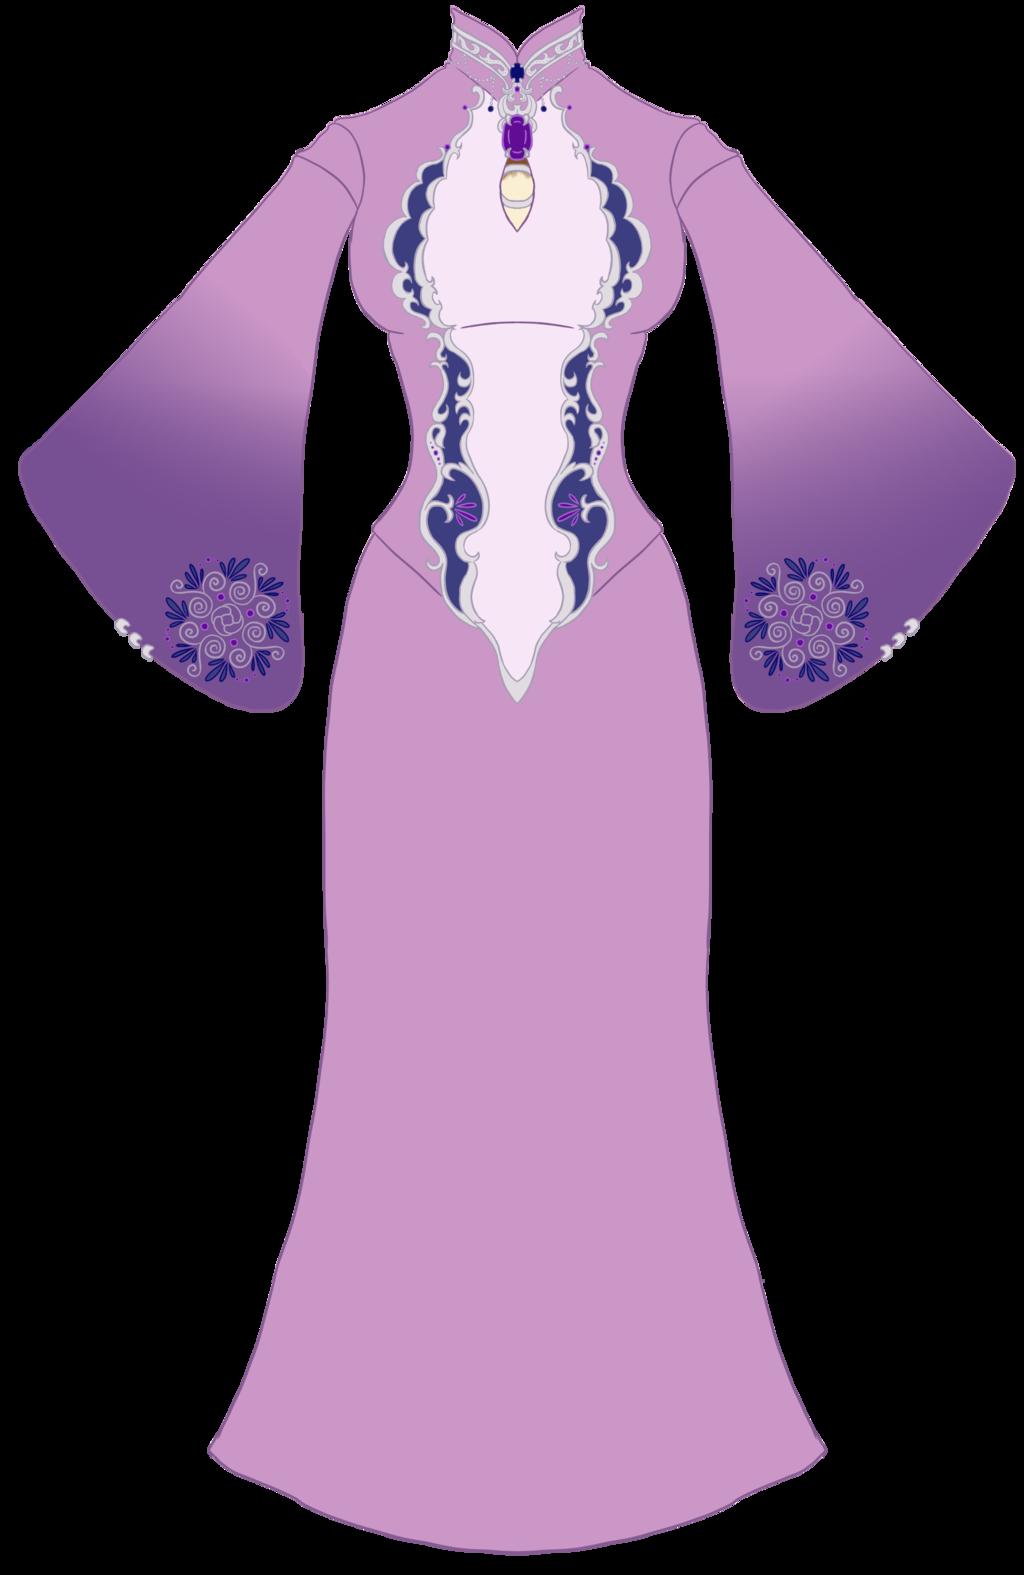 Most recent image: Issuldra's Dress